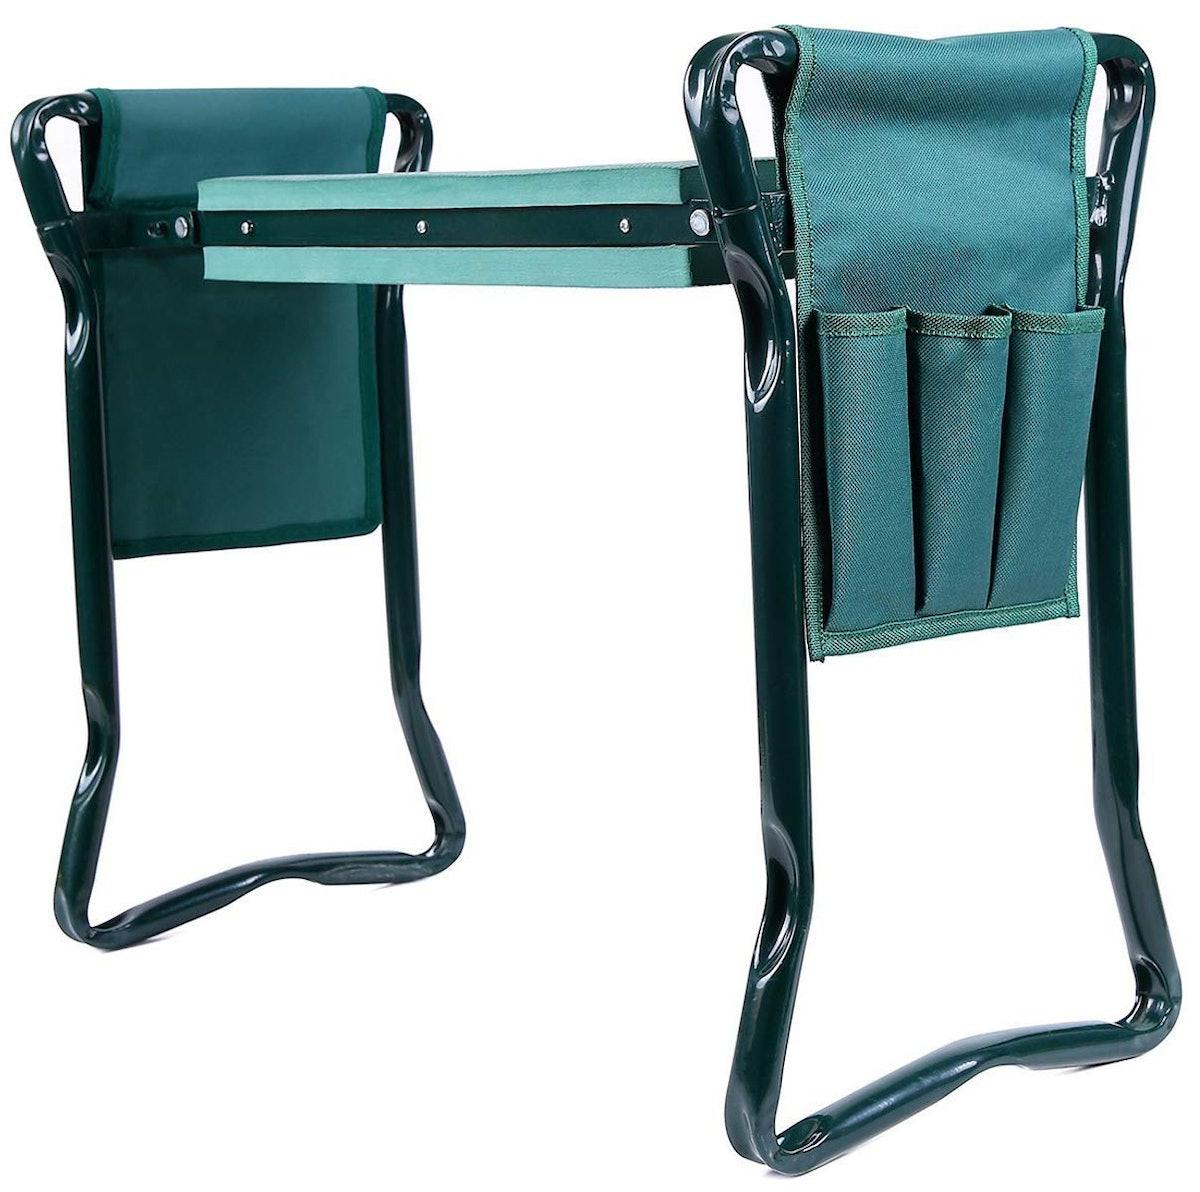 Ohuhu Garden Kneeler & Seat